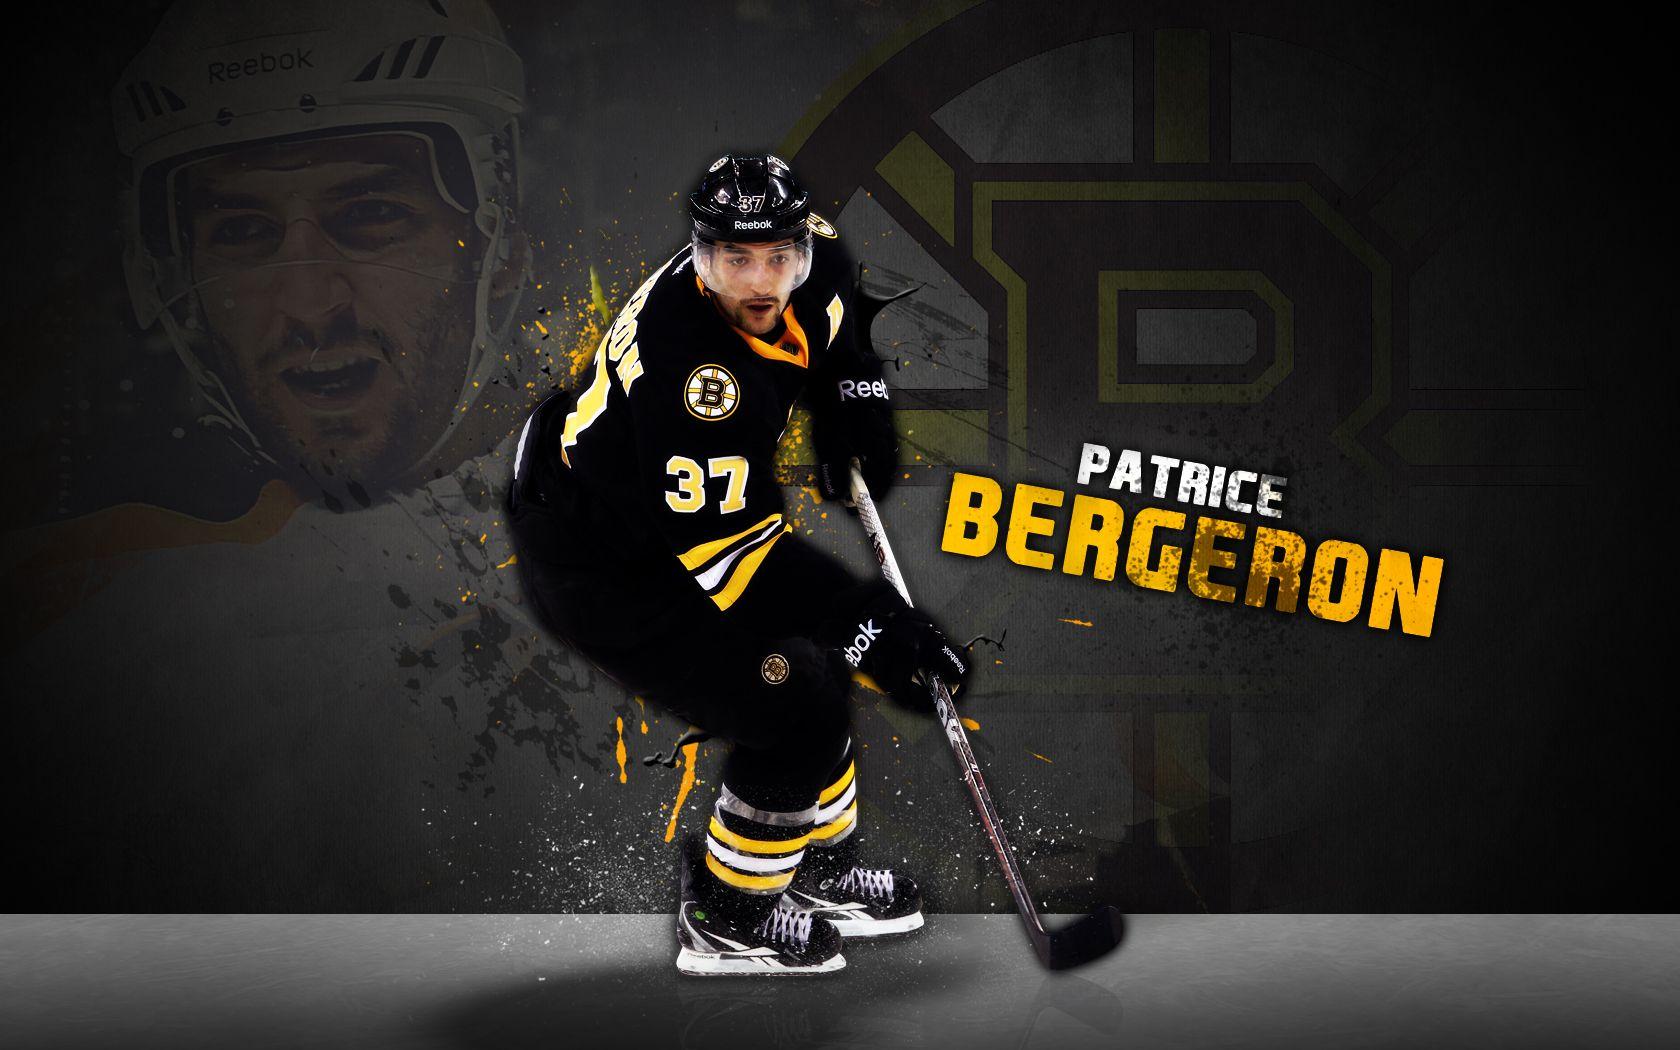 Patrice Bergeron Nhl Wallpaper Patrice Bergeron Bruins Patrice